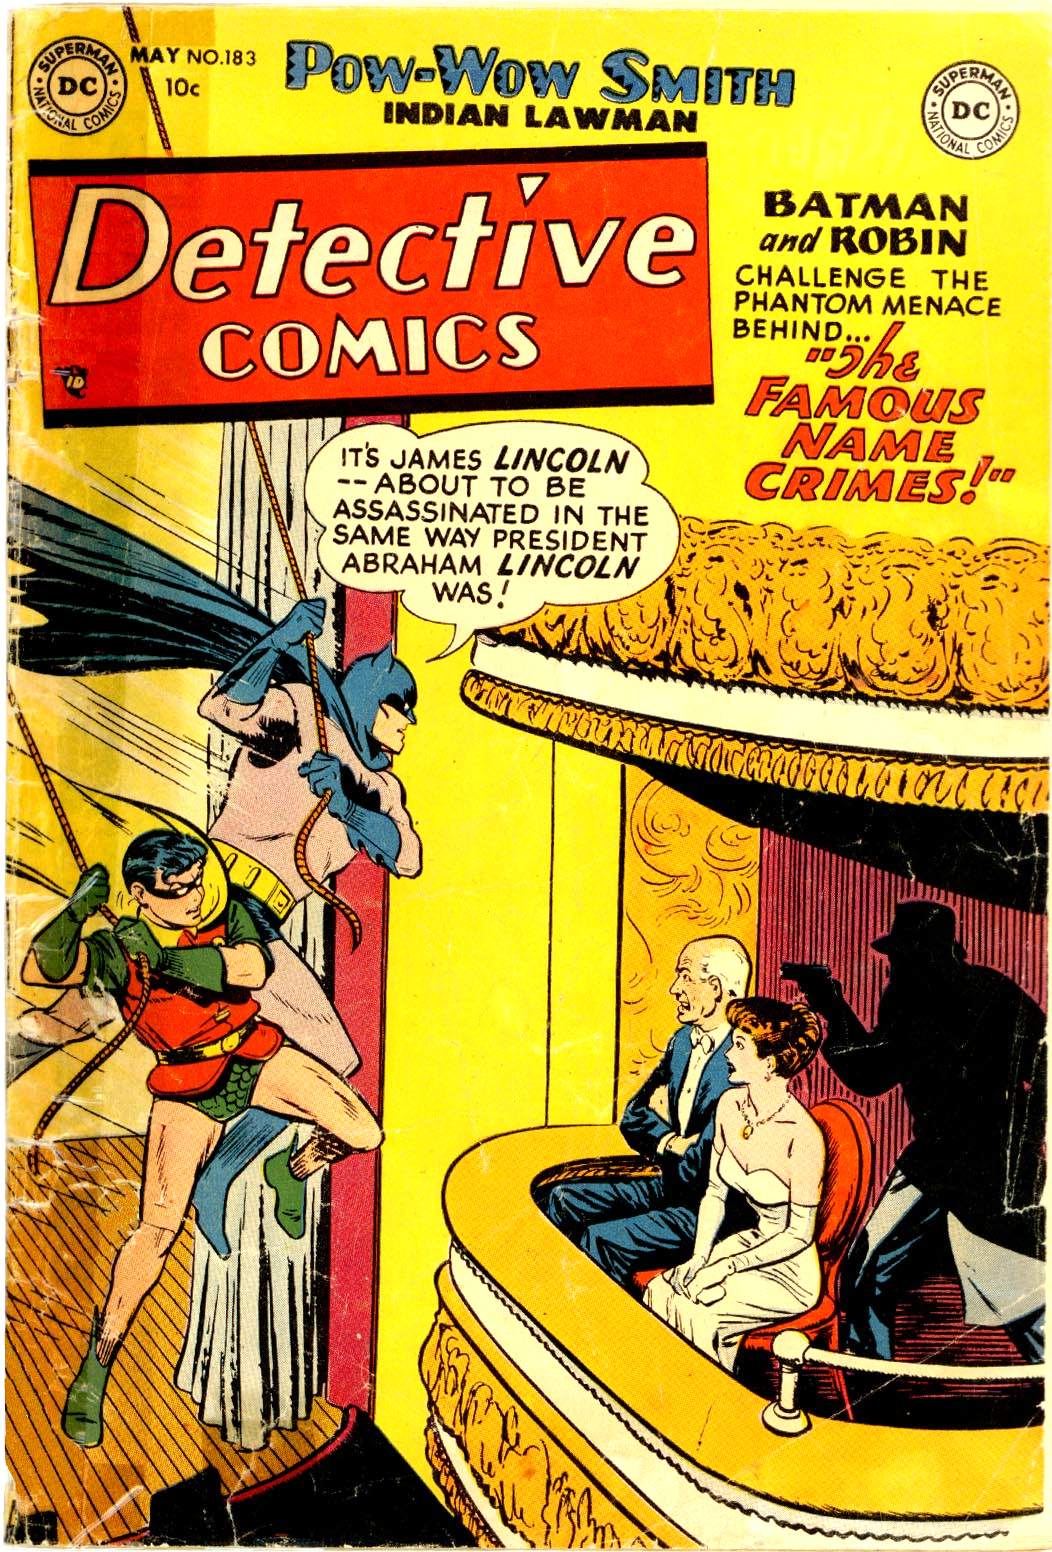 Detective Comics (1937) 183 Page 1